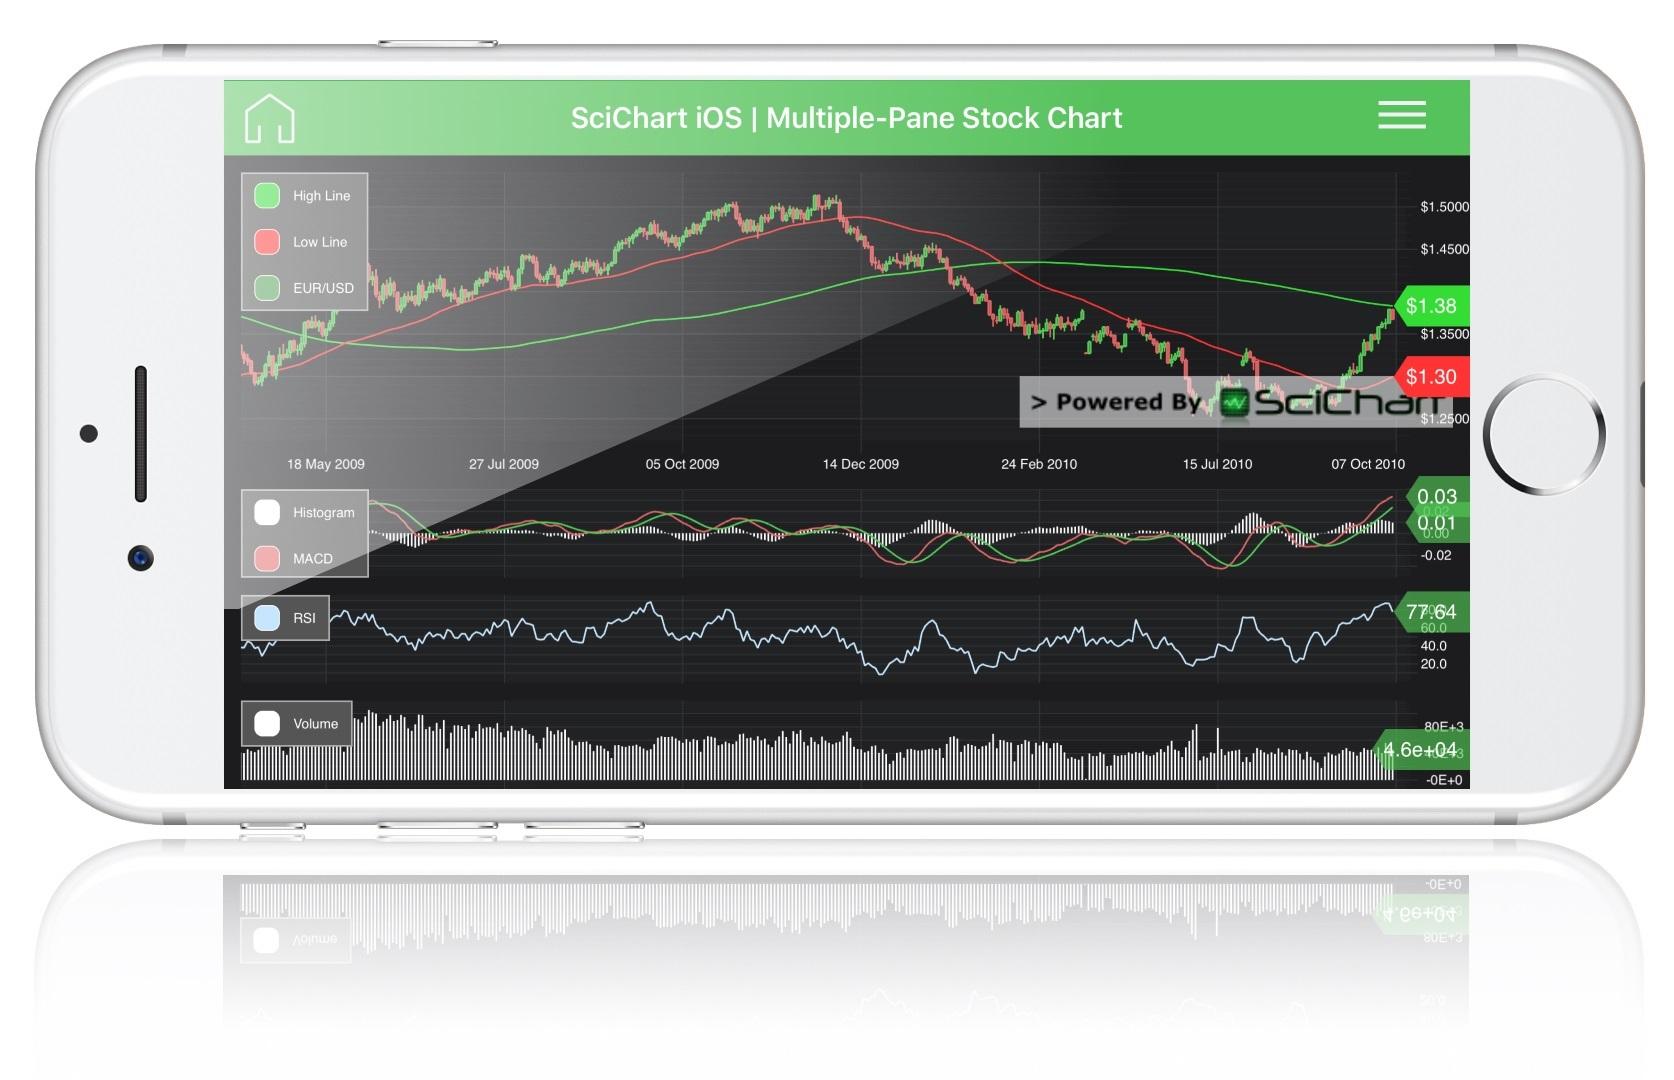 iOS Multi Pane Stock Chart